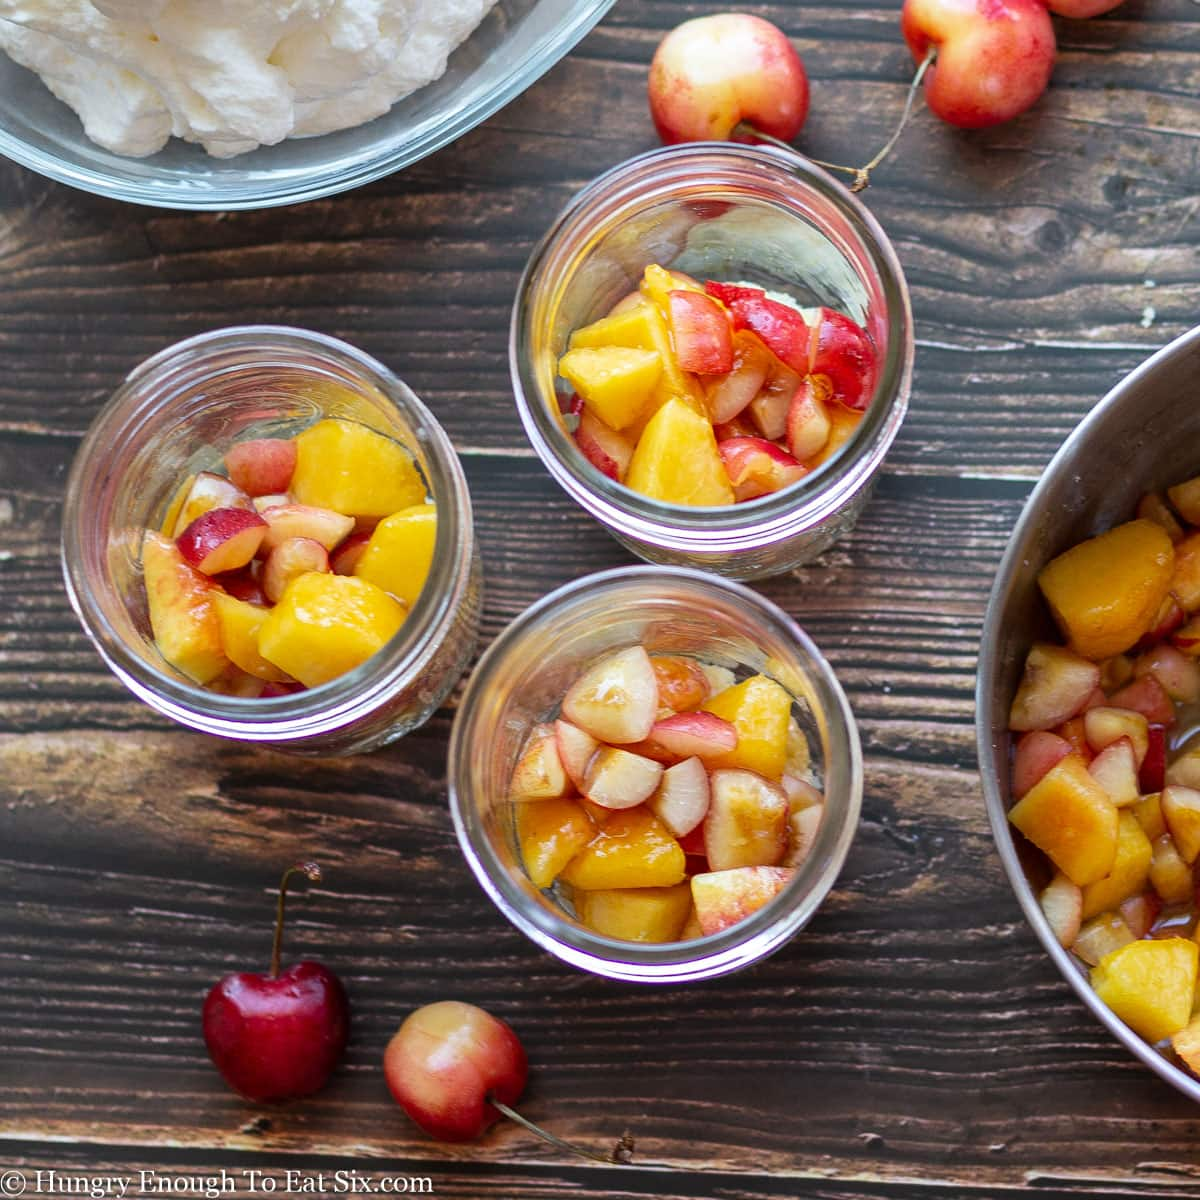 Glass mason jars with fruit and shortcake inside.